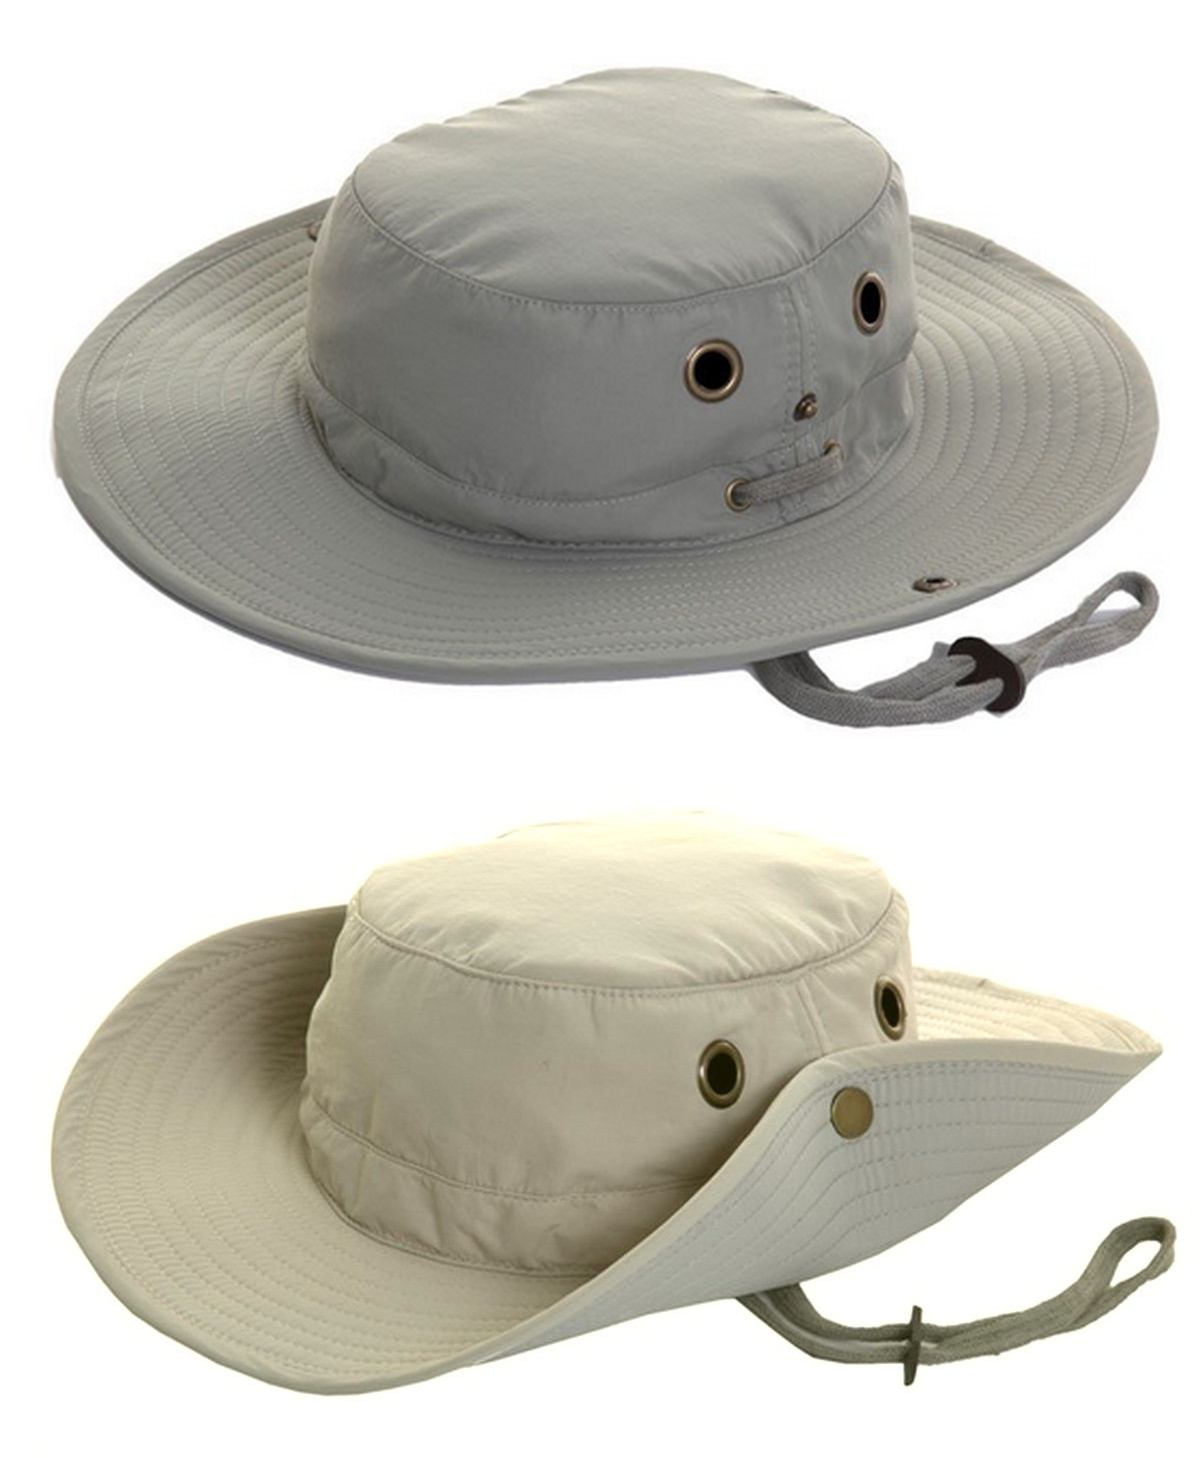 e4e27beb Mens Lightweight Wide Brim Aussie Sun Hat Hidden Pocket Green Beige S M L  XL XXL